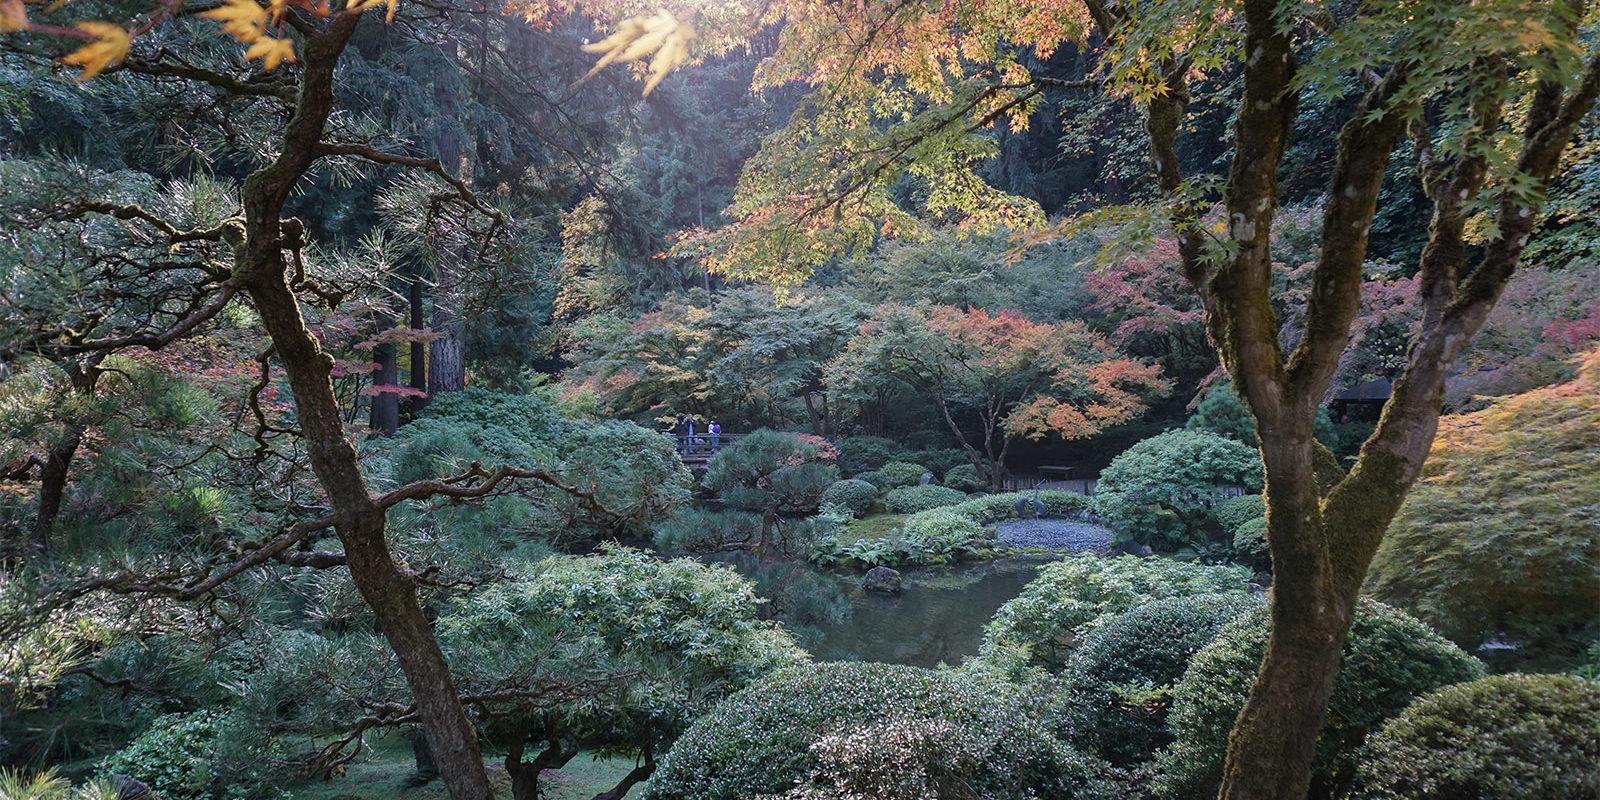 October Fall Photos of Portland Japanese Garden - 2018-10-22 - DSC01057_low